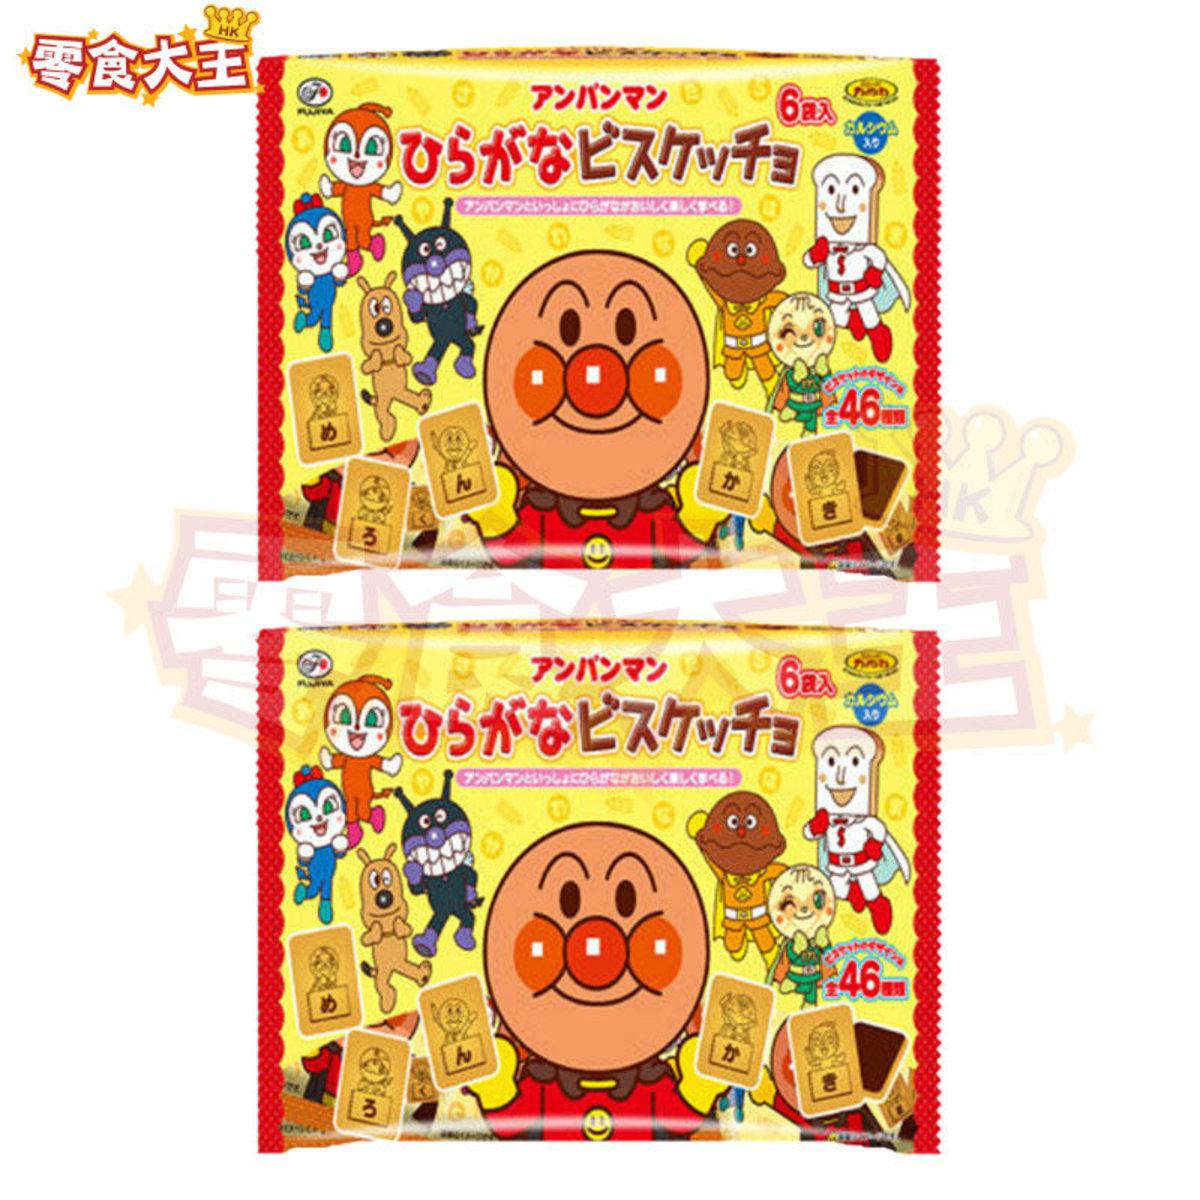 Anpanman Hiragana Bisketch 108g x 2 bags (4902555133591_2)